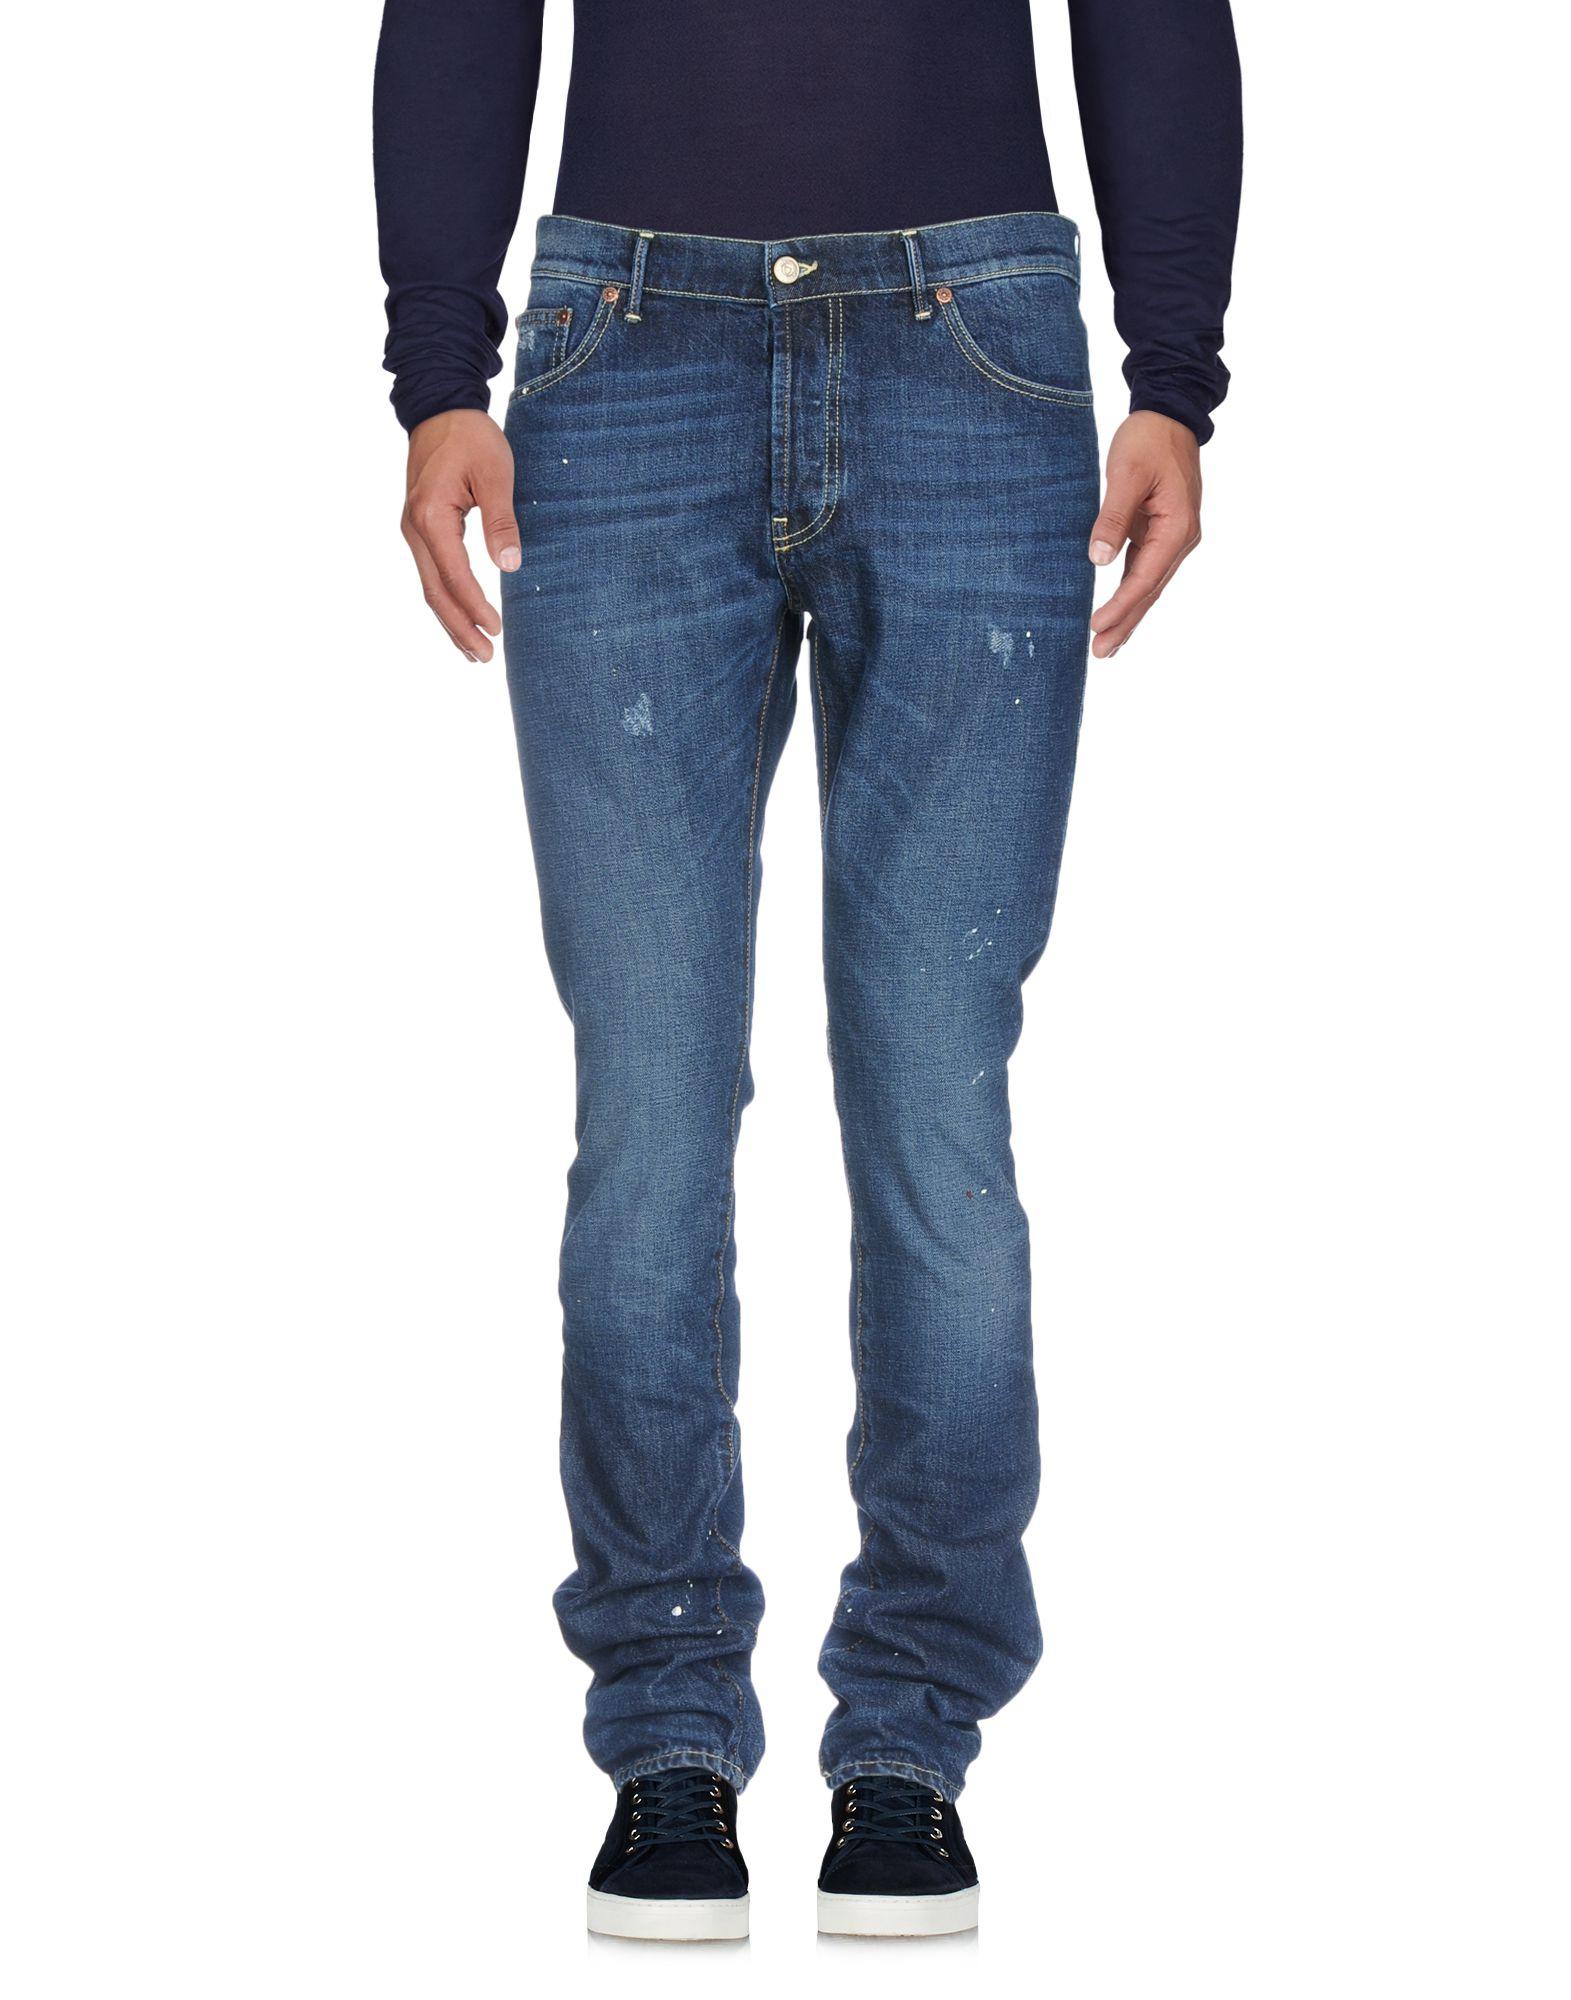 Pantaloni Jeans Htc Donna - Acquista online su